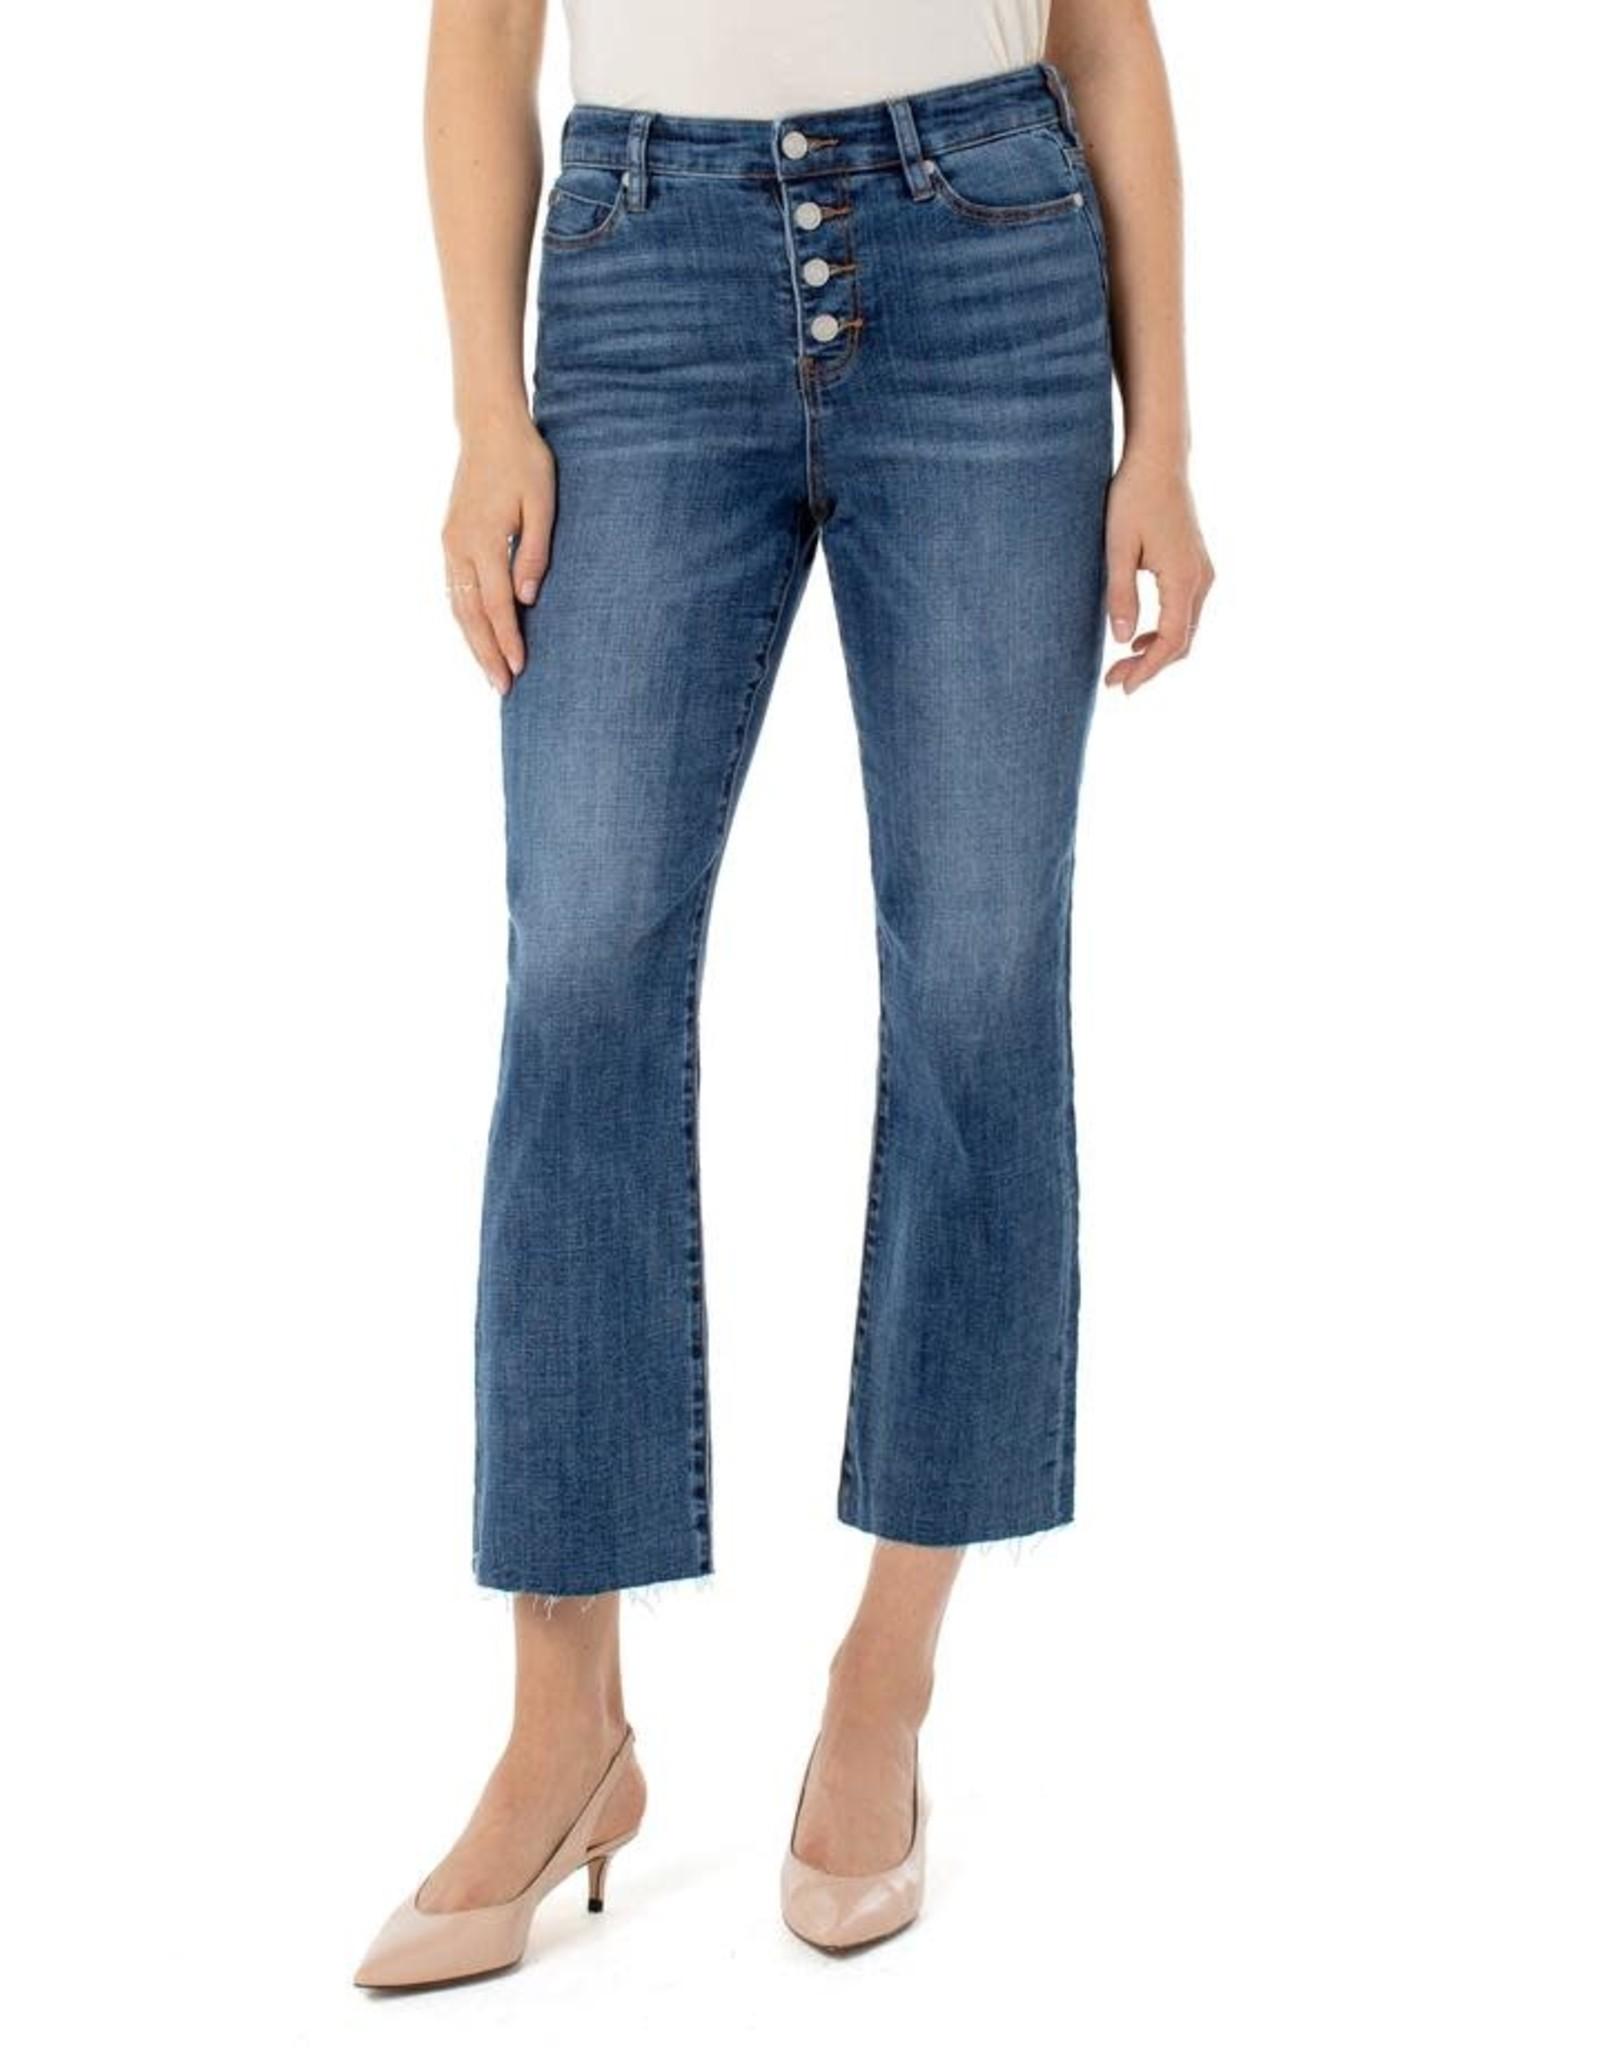 Wm's Jeans Hazel's Haven